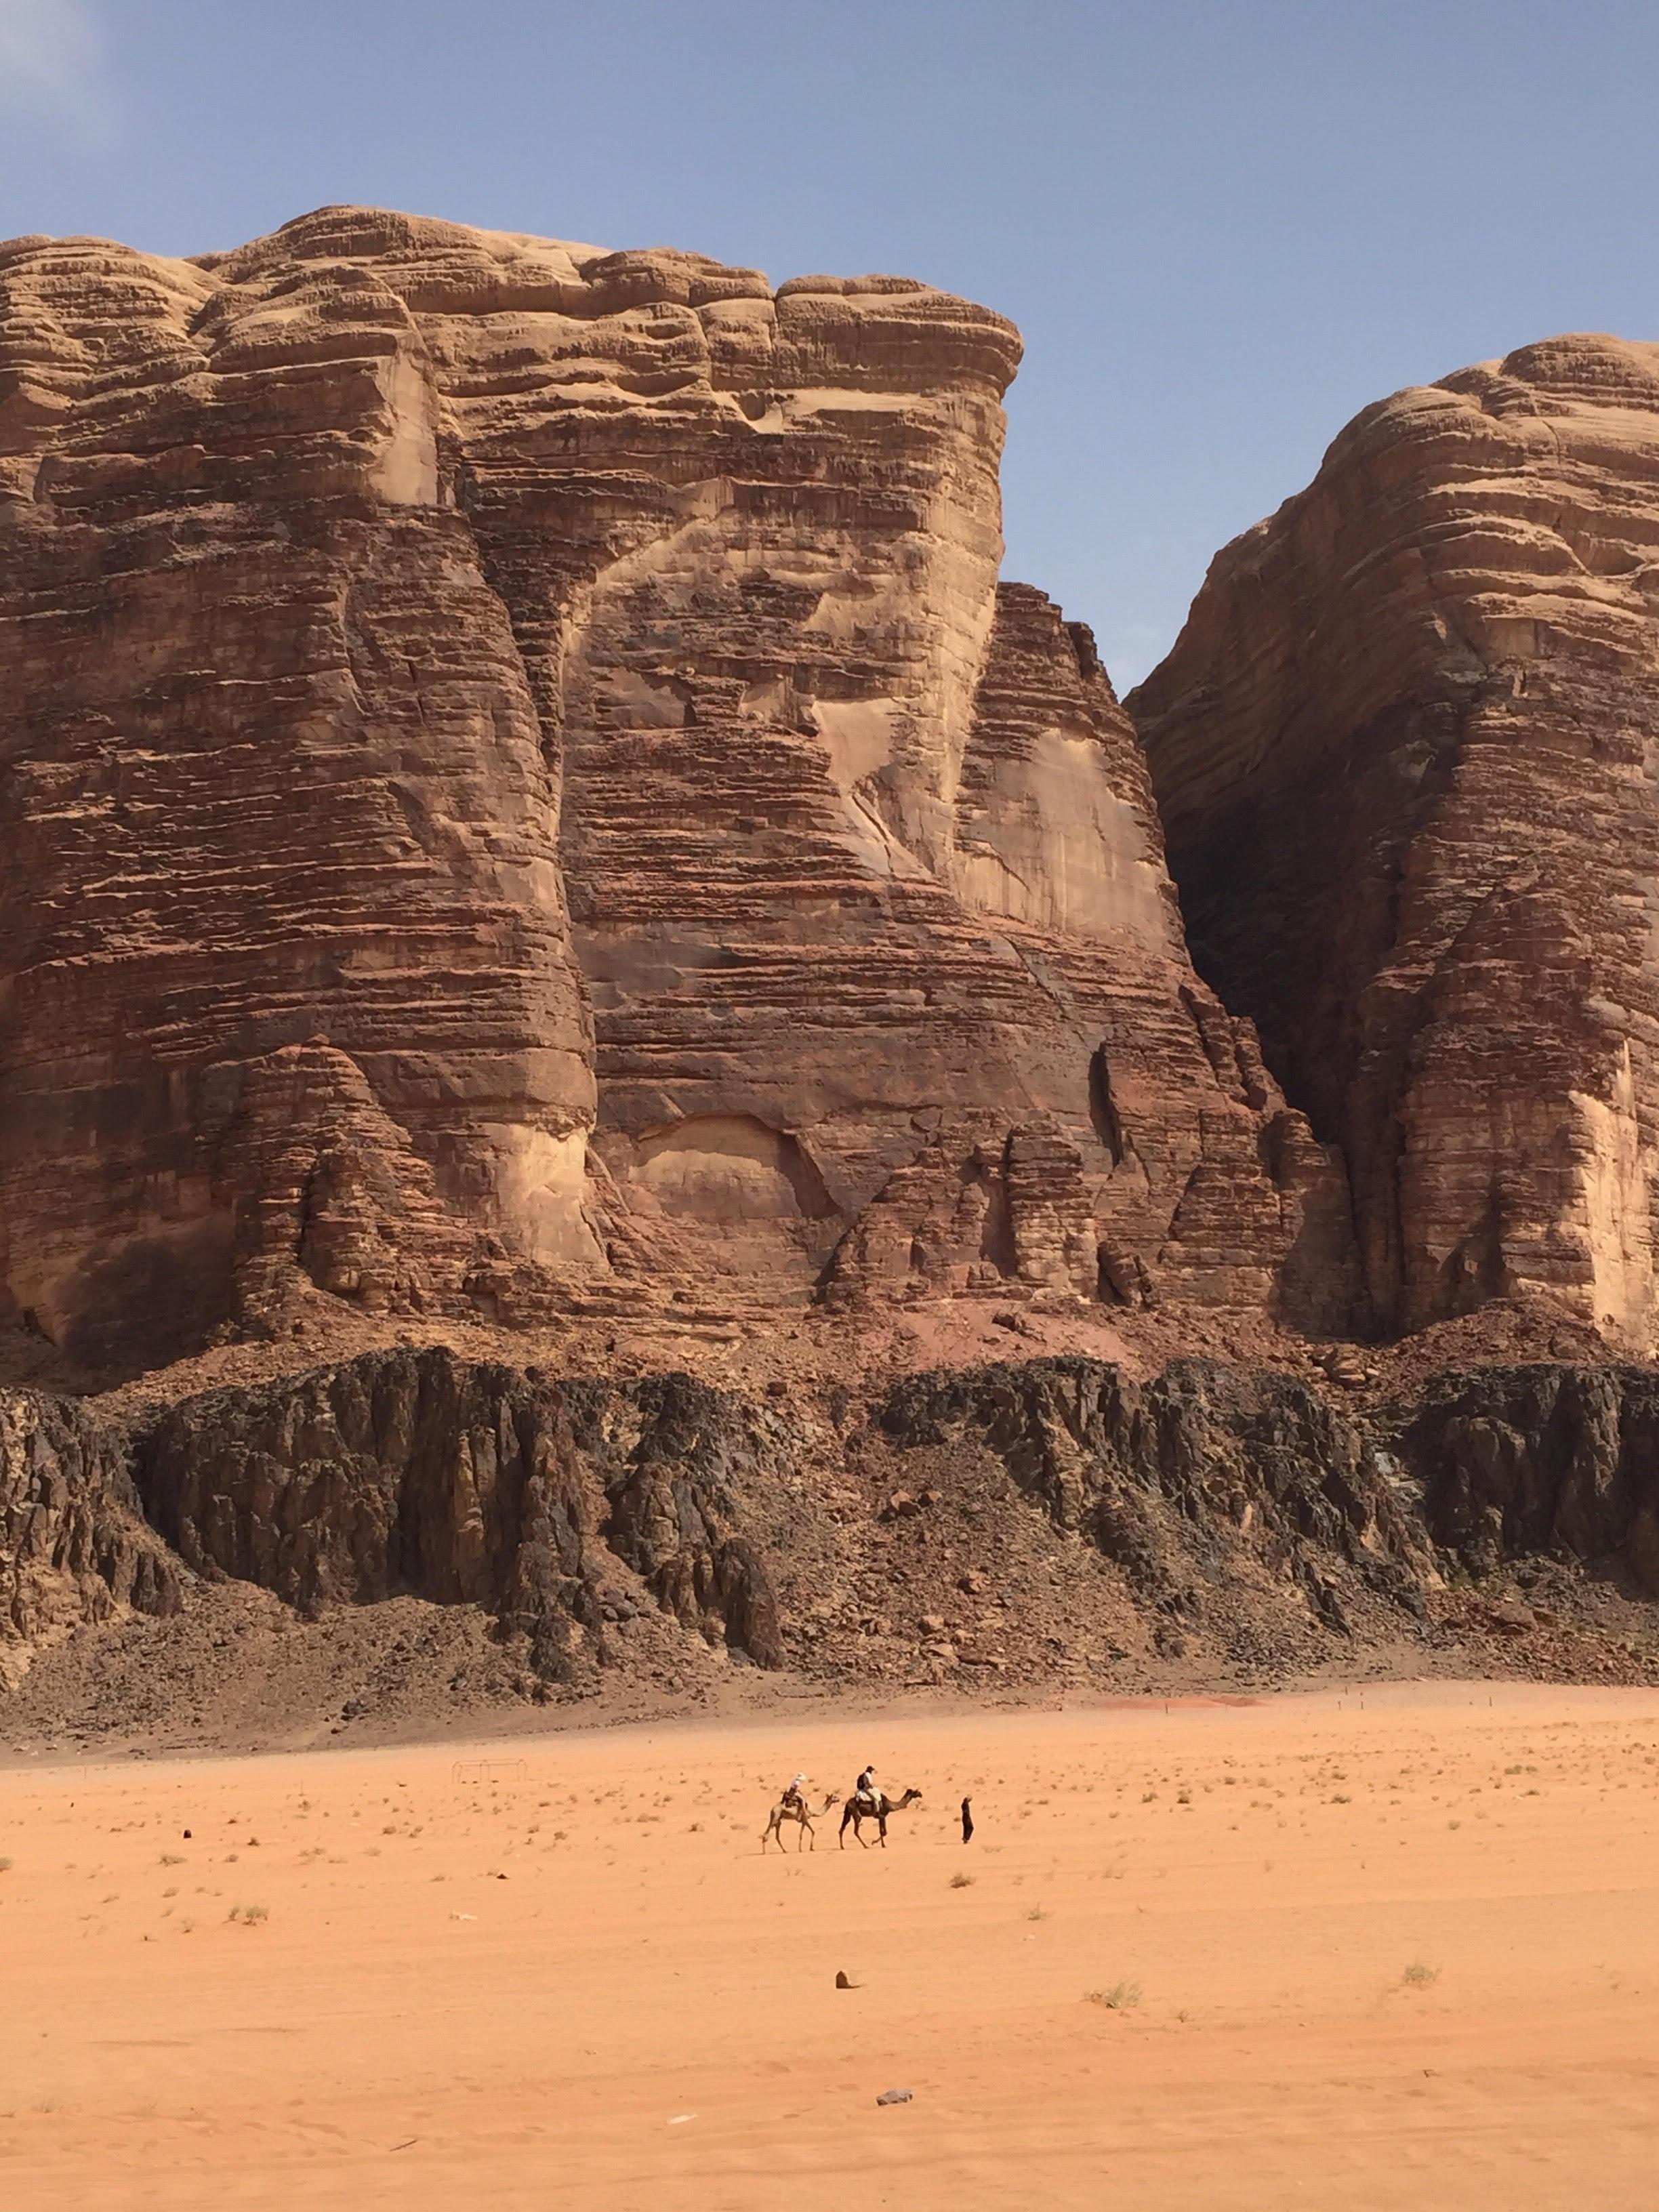 Travelling by Camel in the Wadi Rum Desert. Photo taken by Jurick Wessels,  @jurickwessels on Instagram .